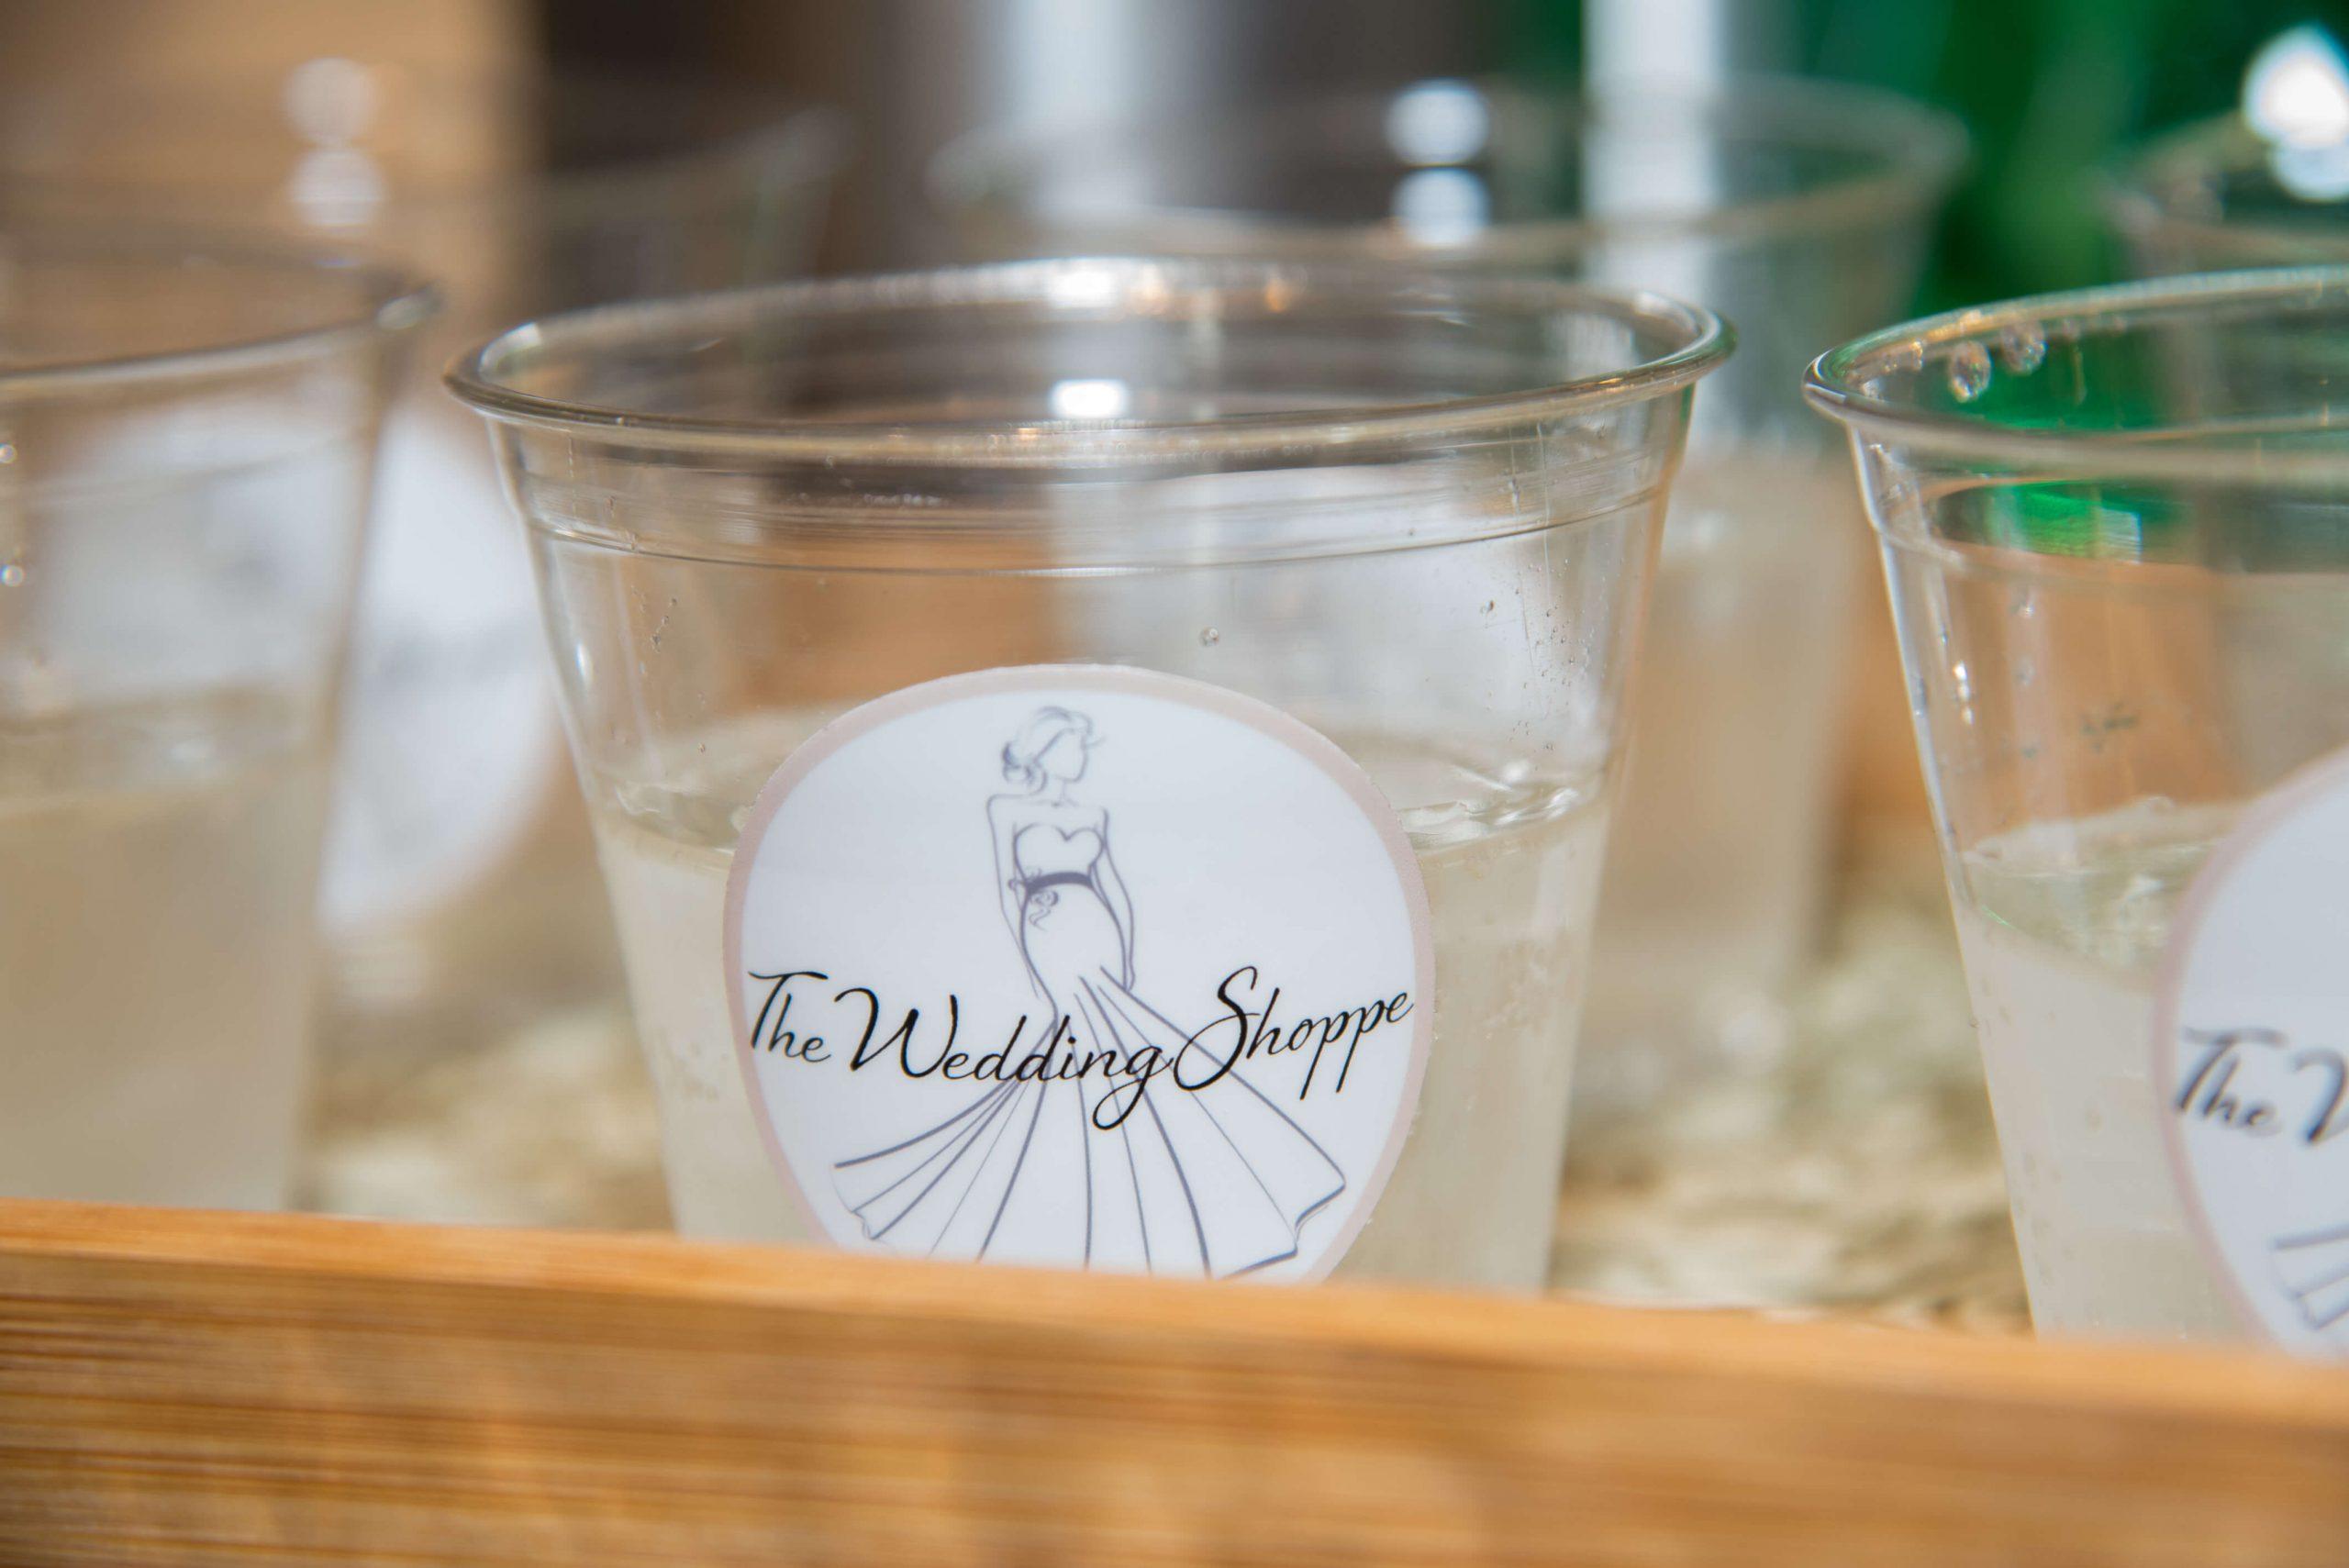 Wedding Shoppe drinks